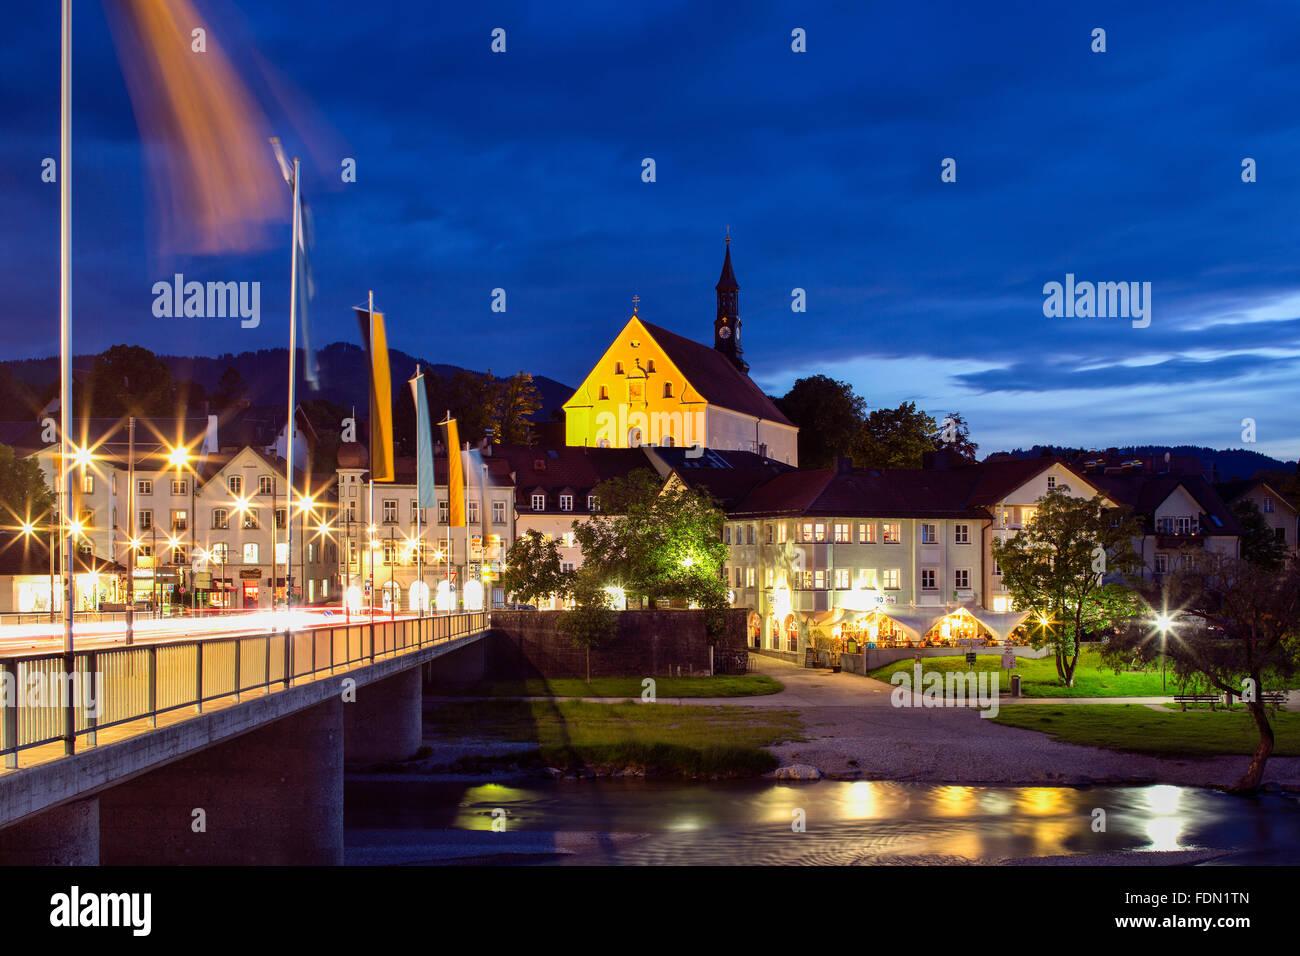 Holy Trinity church, dusk, Bad Tölz, Upper Bavaria, Bavaria, Germany - Stock Image